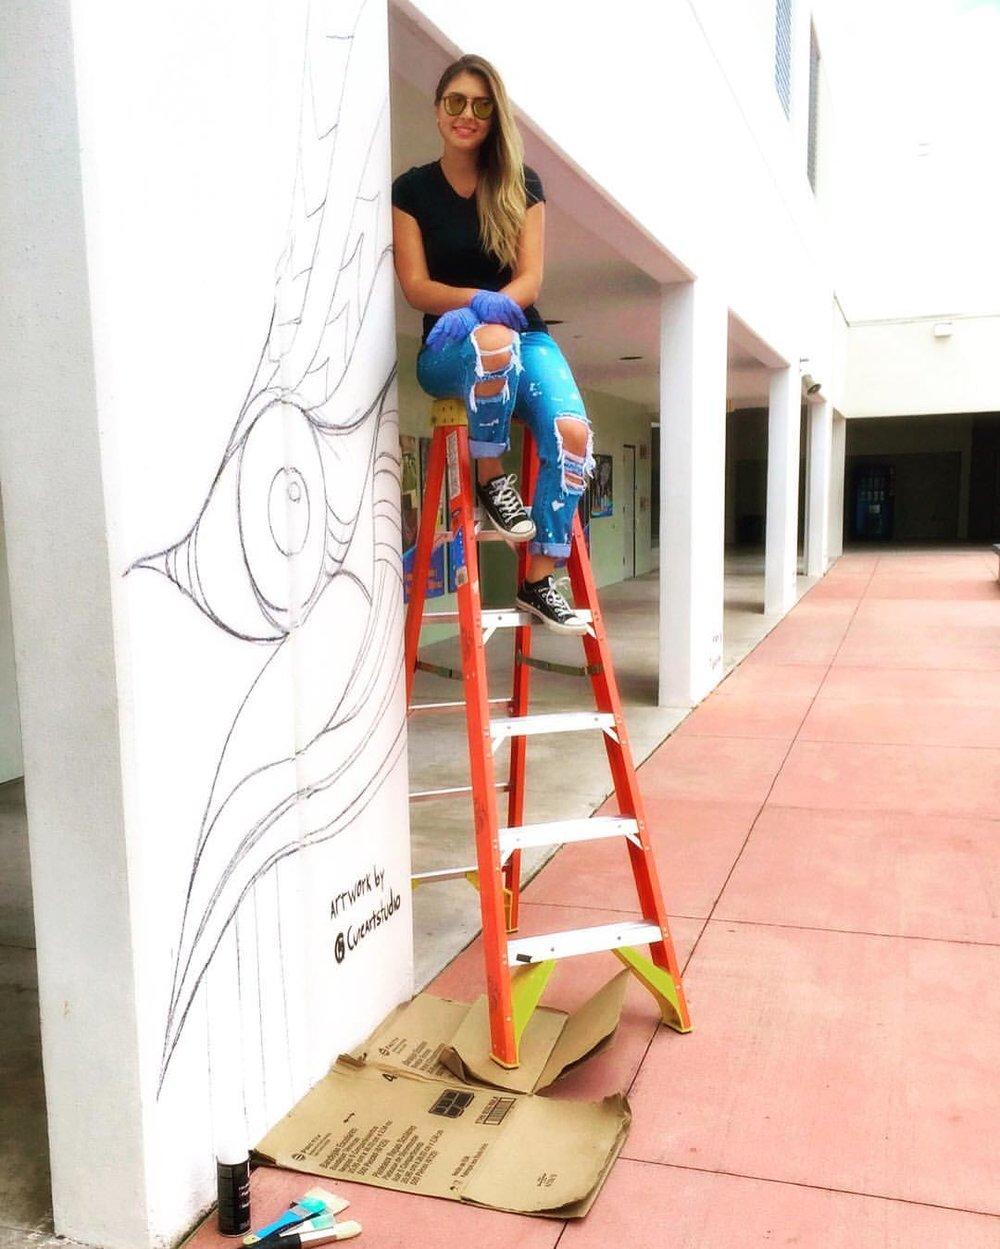 mural-rrhs2.jpg